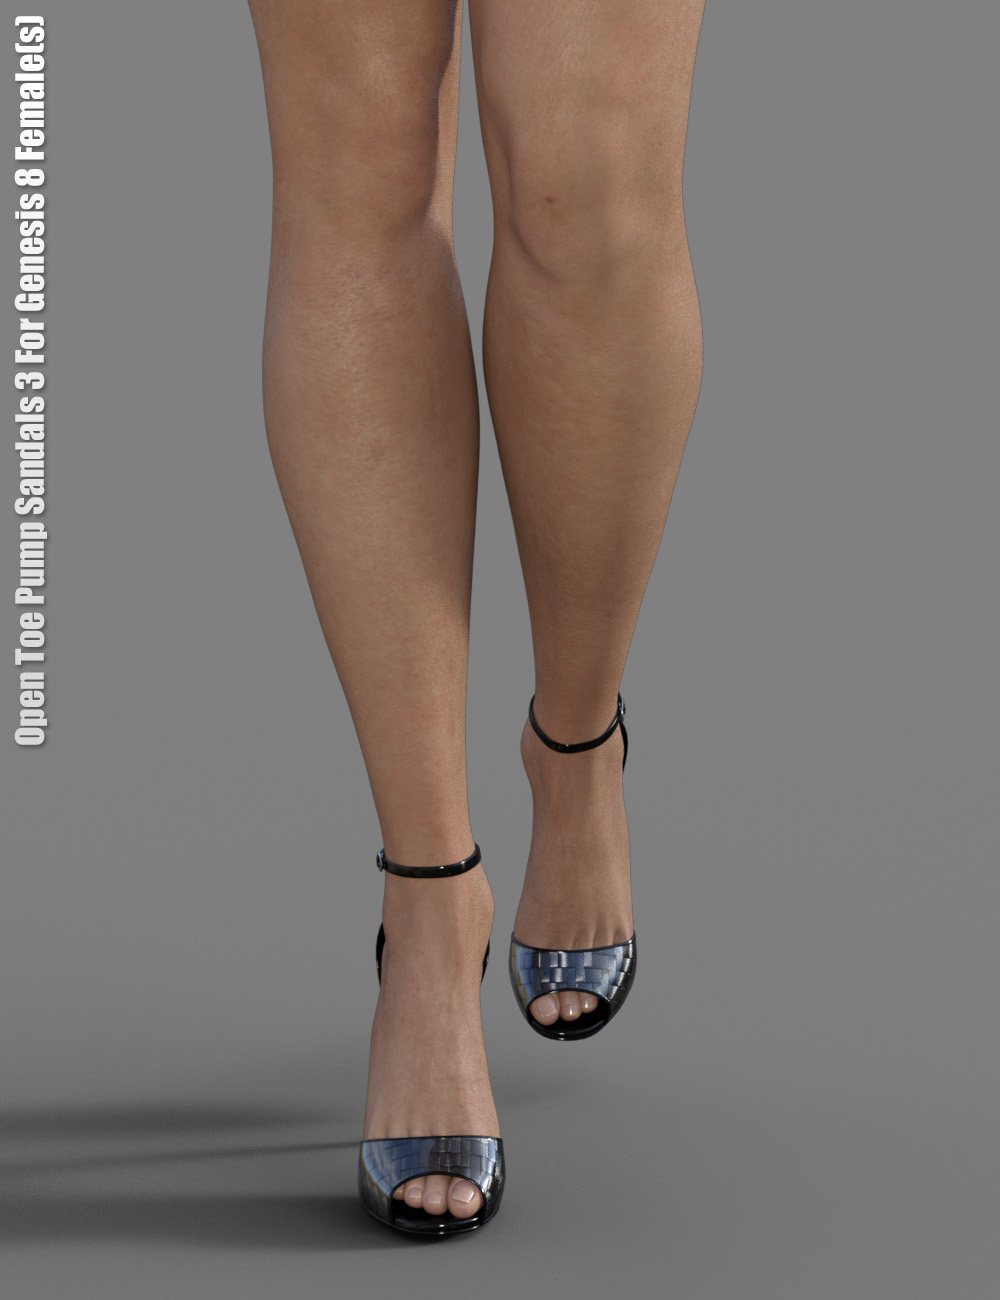 Open Toe Pump Sandals 3 for Genesis 8 Female(s) by: dx30, 3D Models by Daz 3D